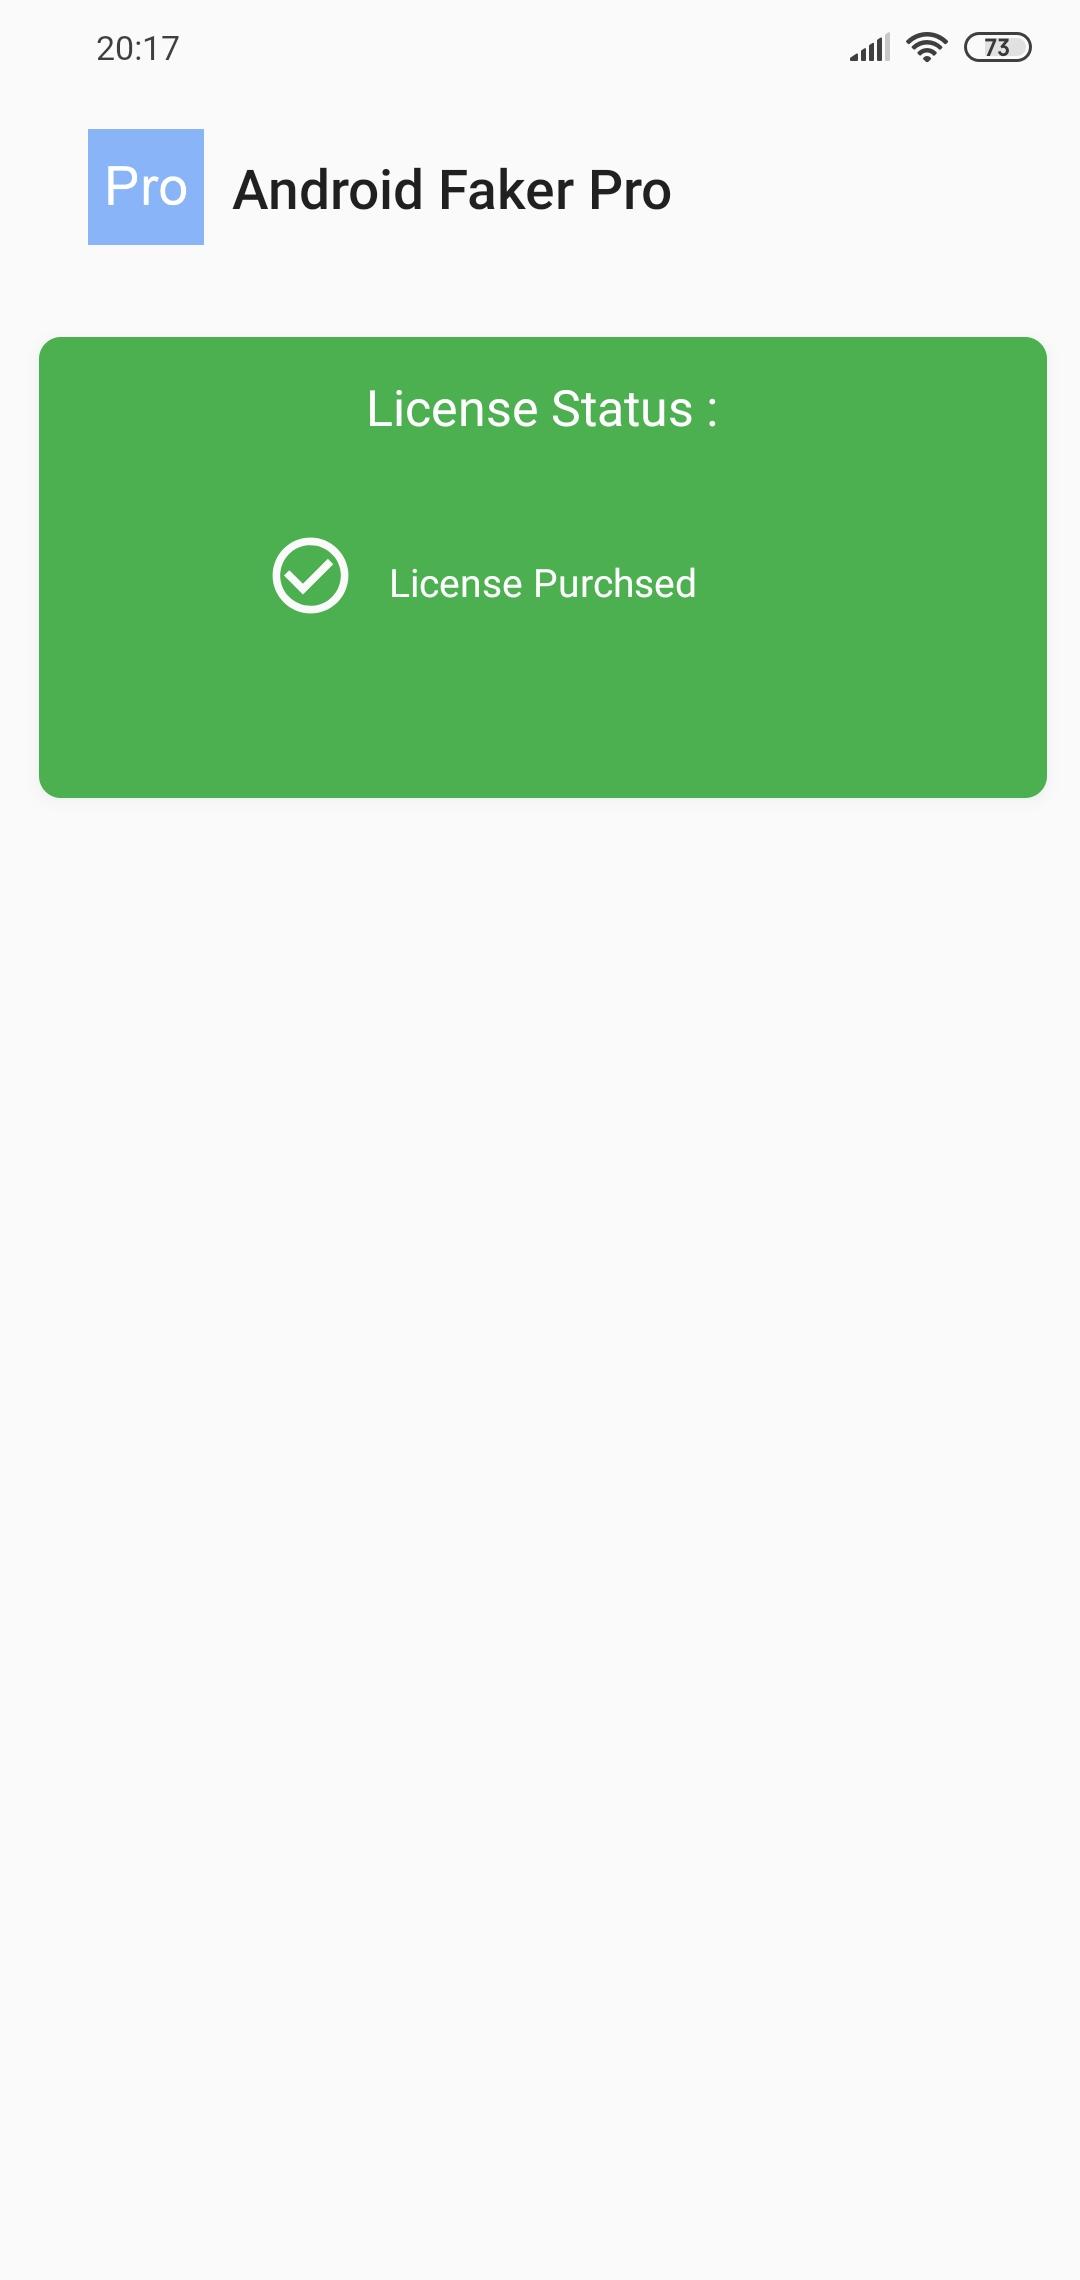 Screenshot_2021-08-26-20-17-55-472_com.androidx.androidfakerpro.jpg